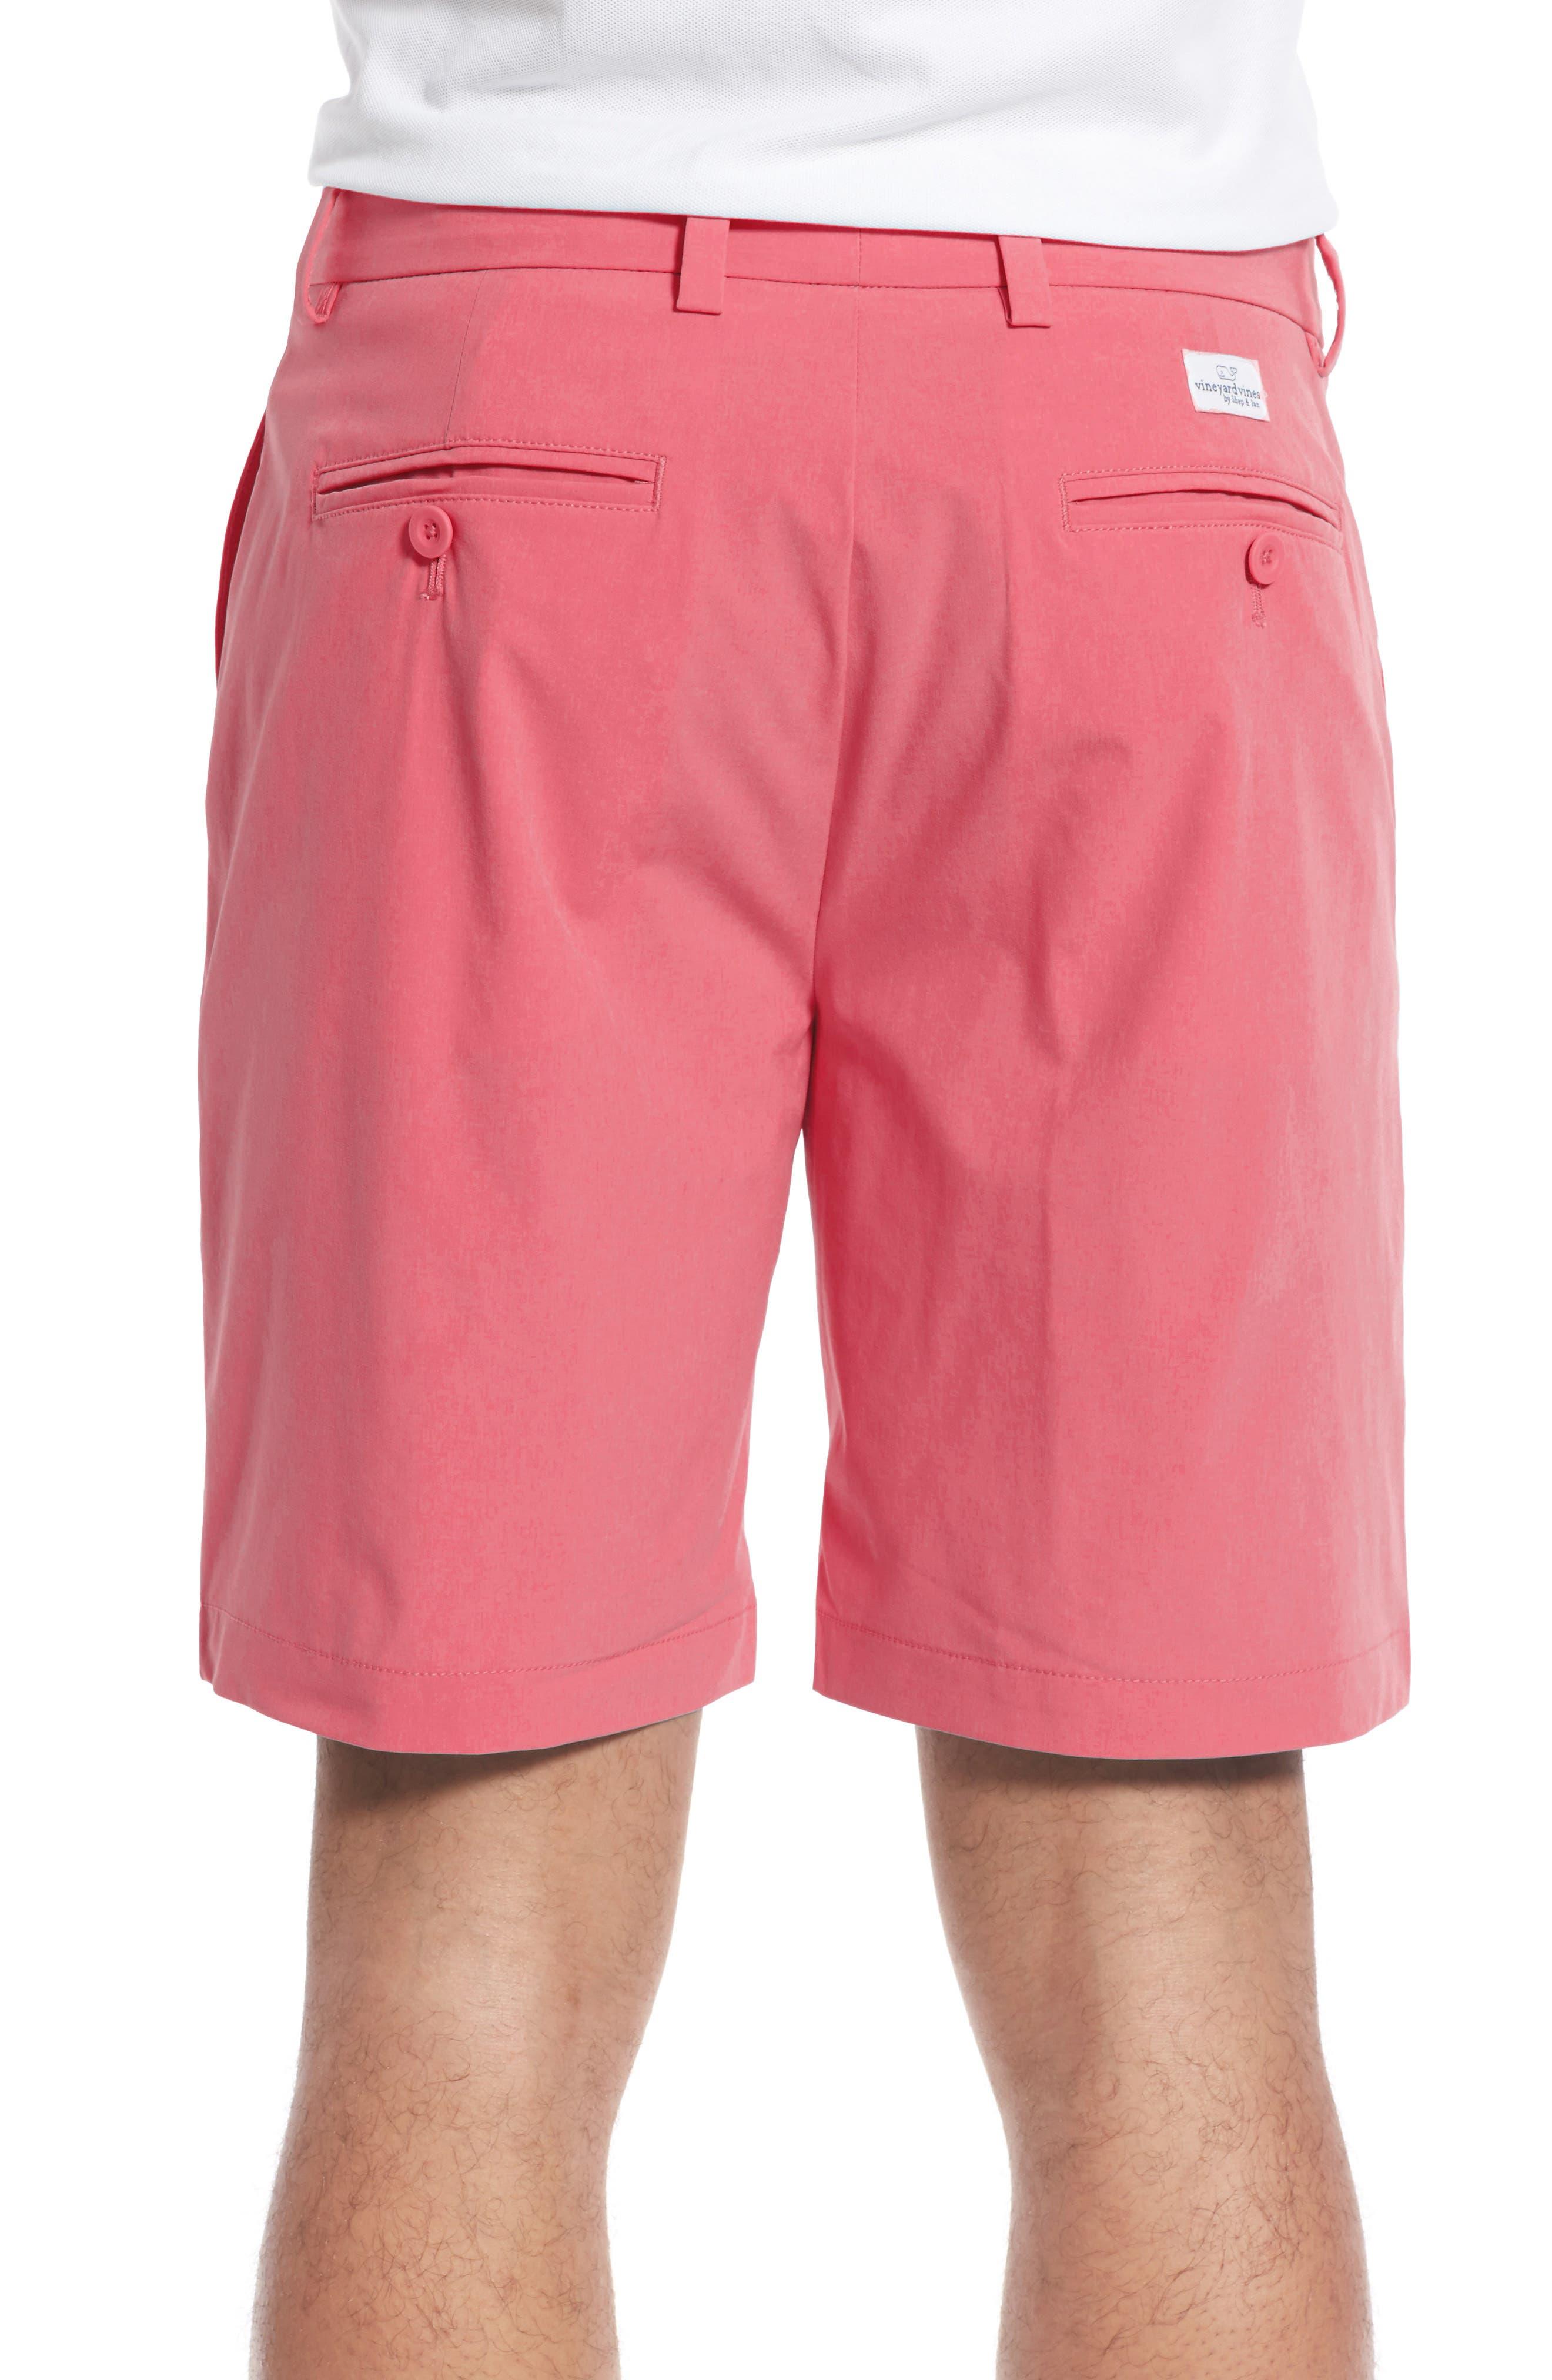 8 Inch Performance Breaker Shorts,                             Alternate thumbnail 30, color,